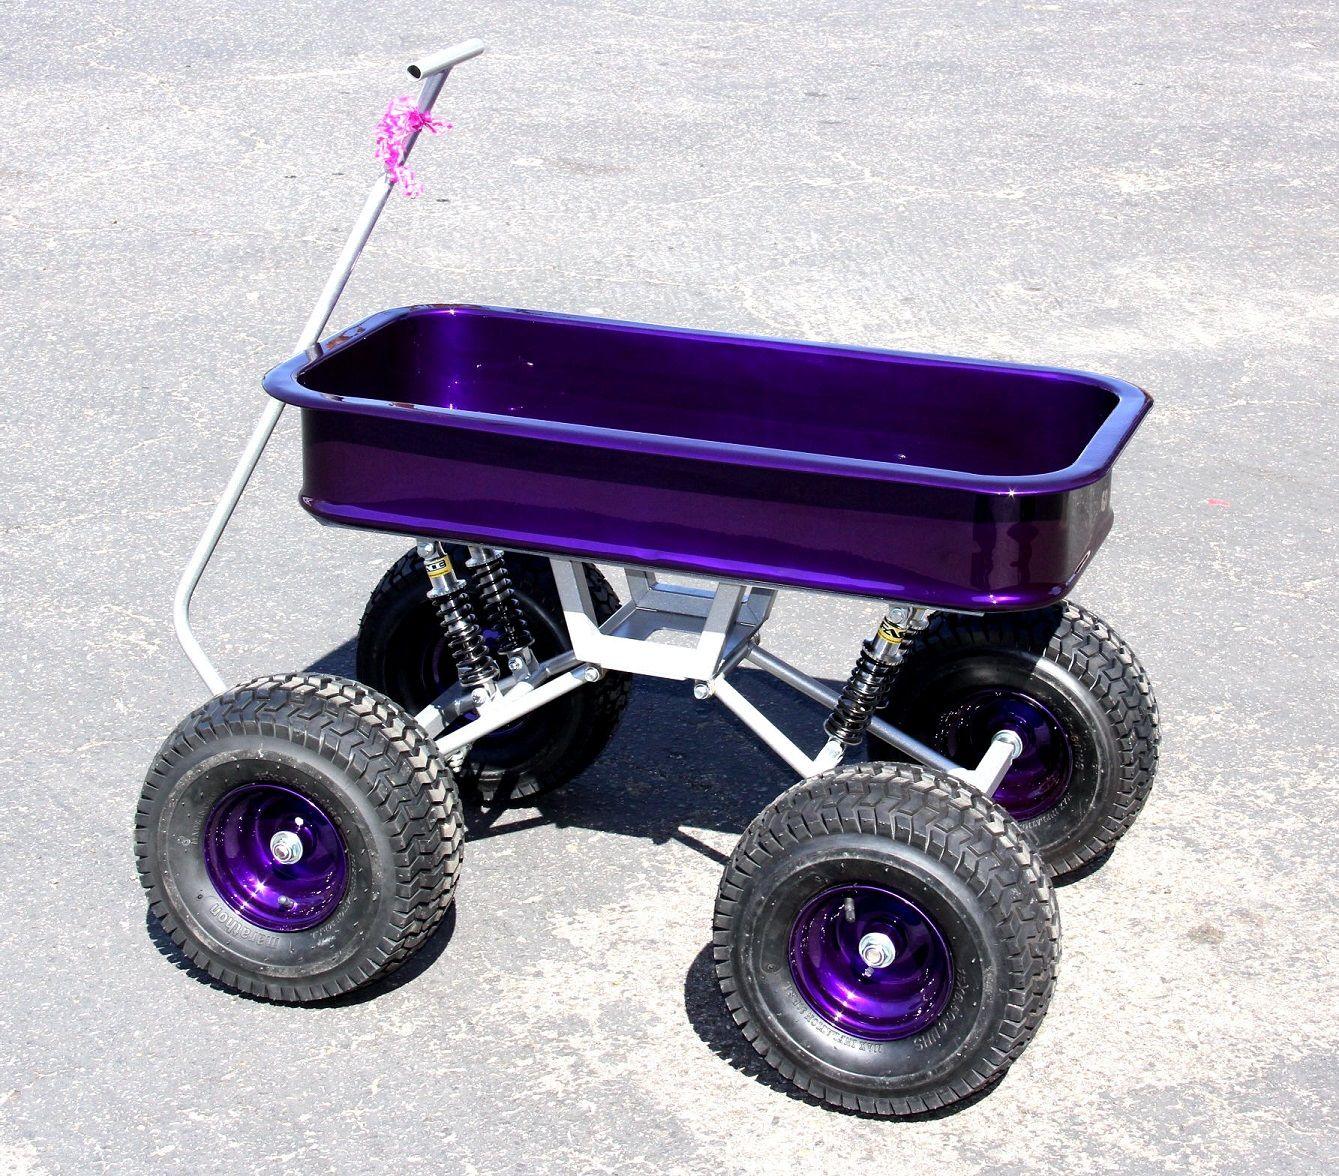 Candy Purple and Metallic Silver swing-arm wagon by Baja Wagon